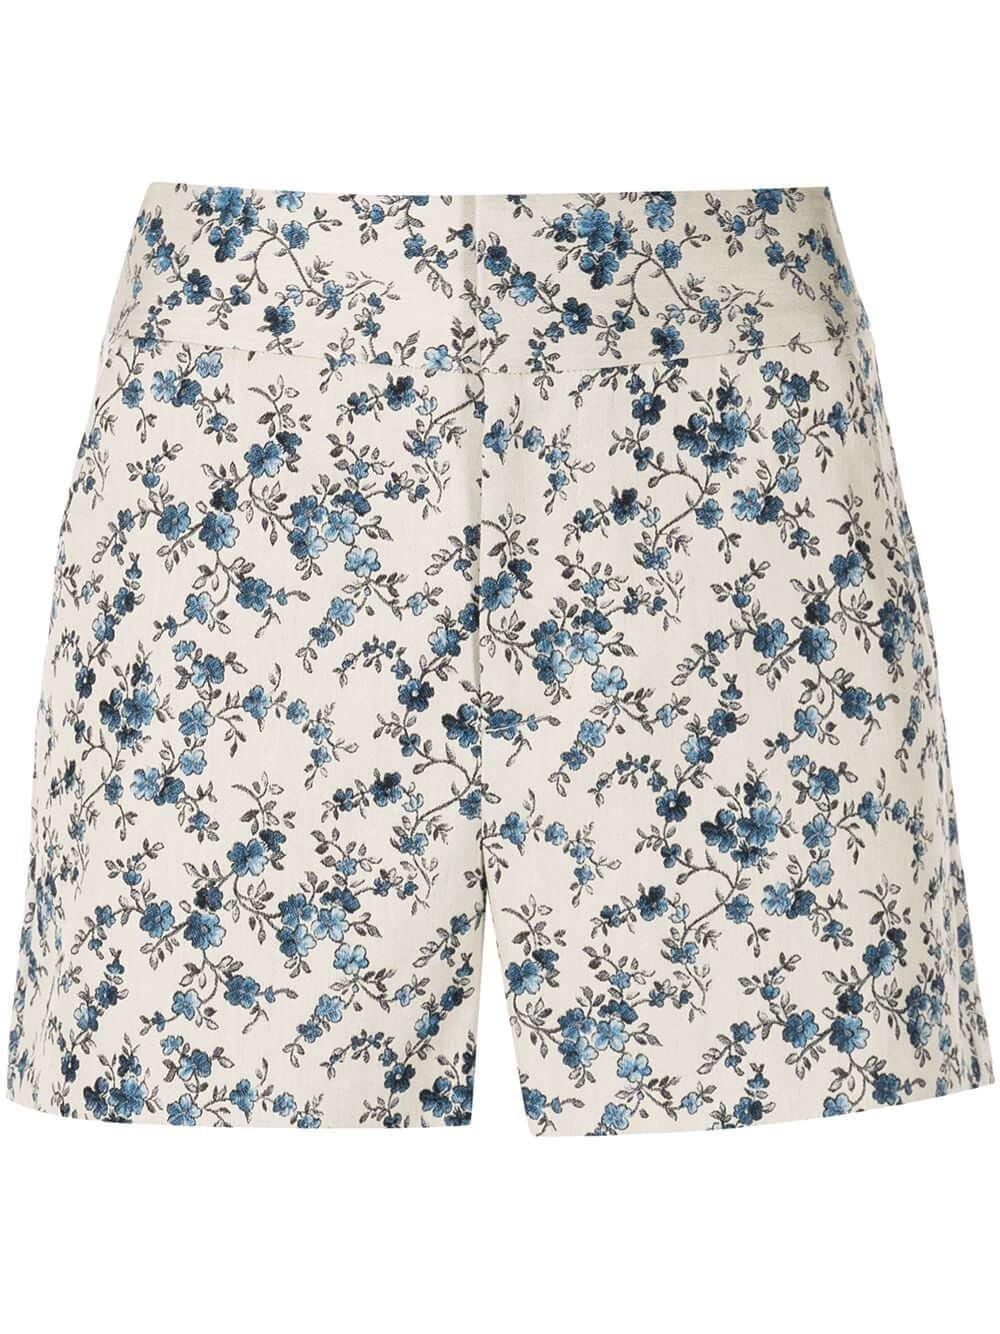 Cady Floral Printed Shorts Item # CC103R36603